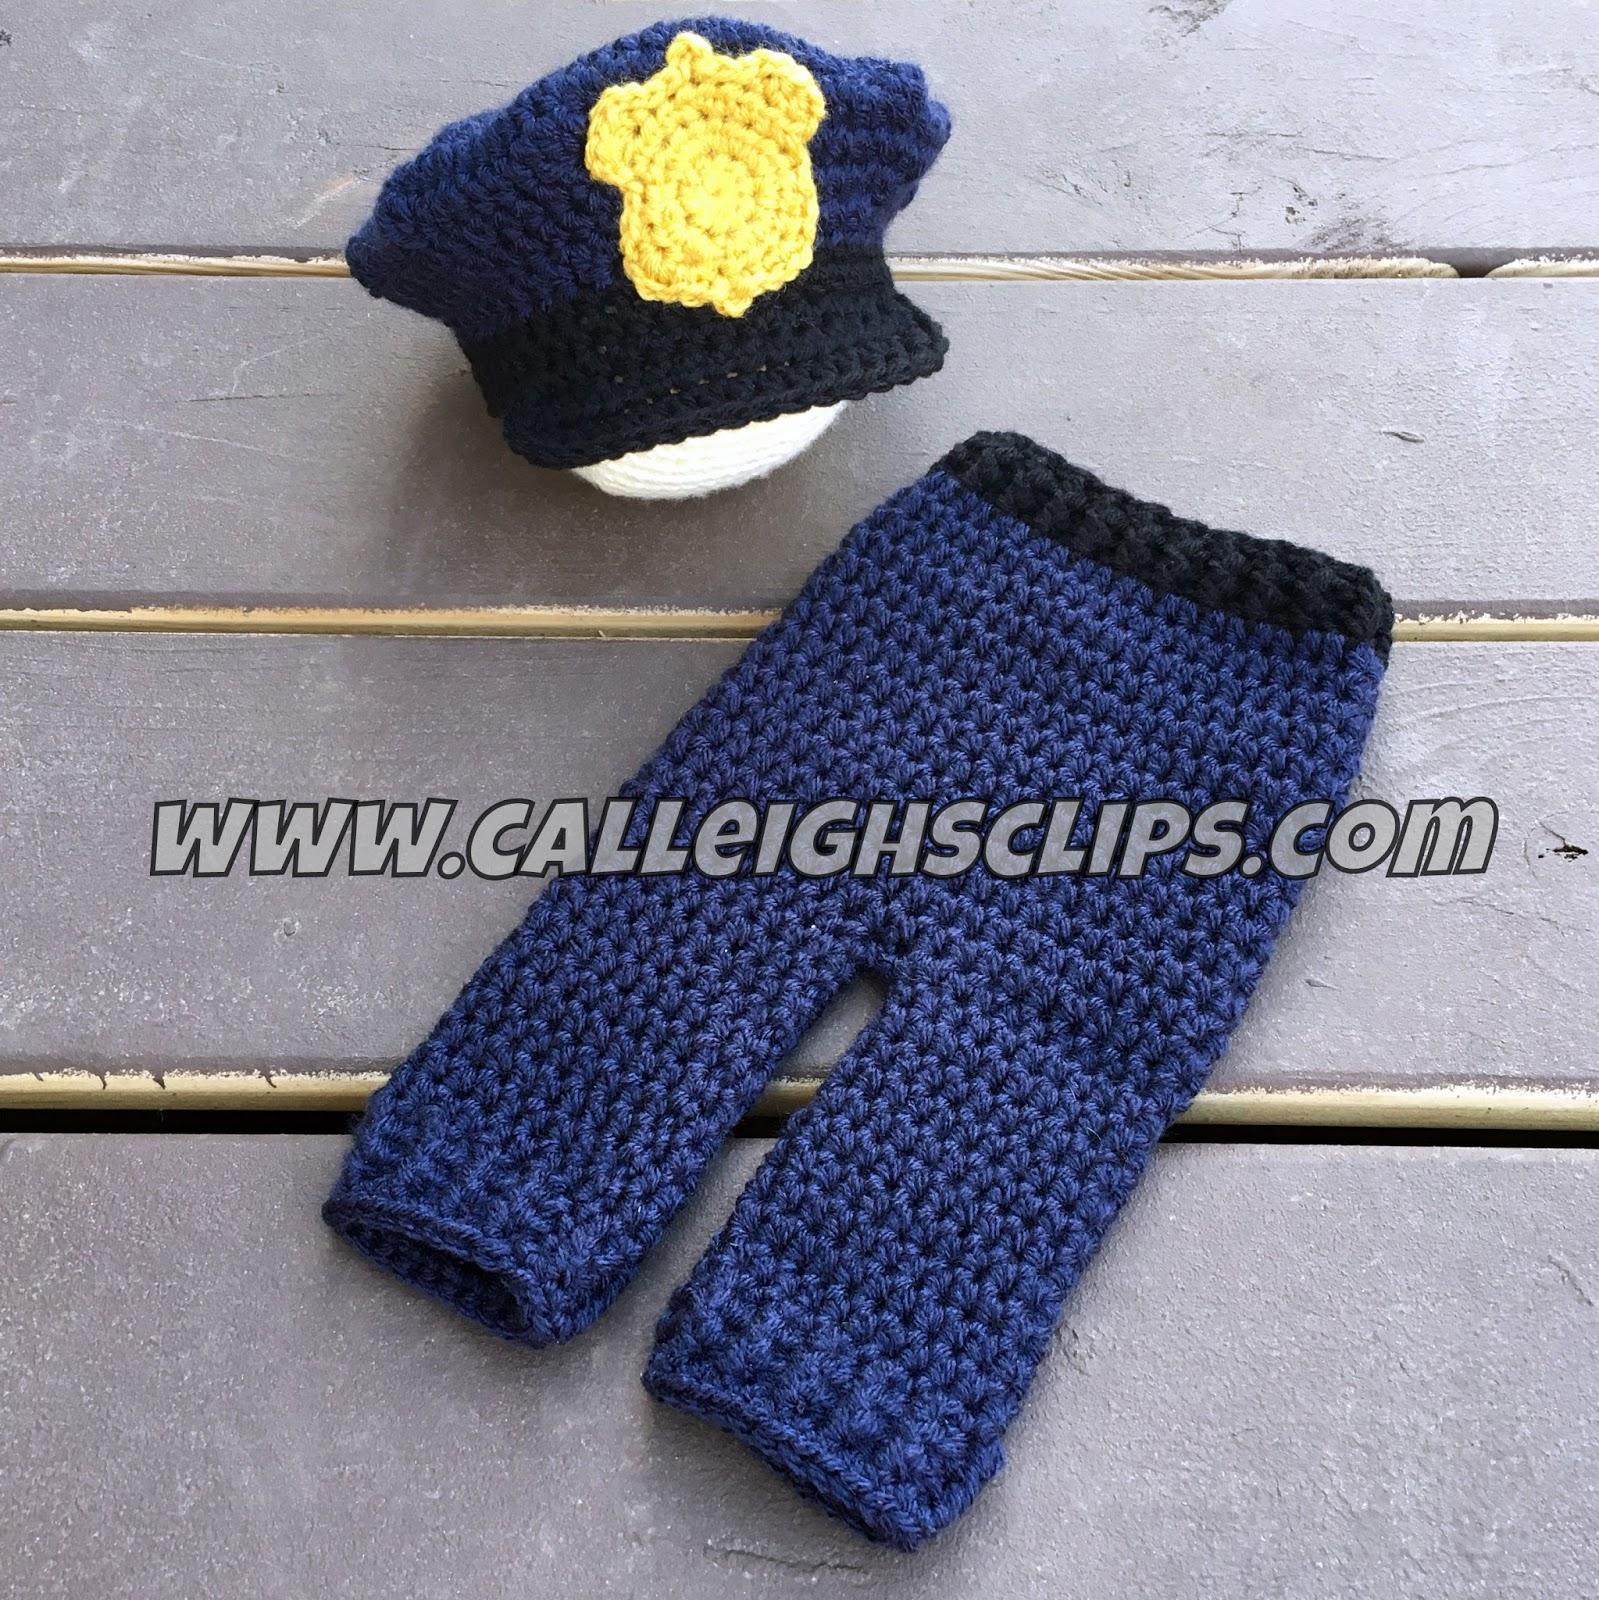 calleigh u0027s clips u0026 crochet creations police officer crochet hat